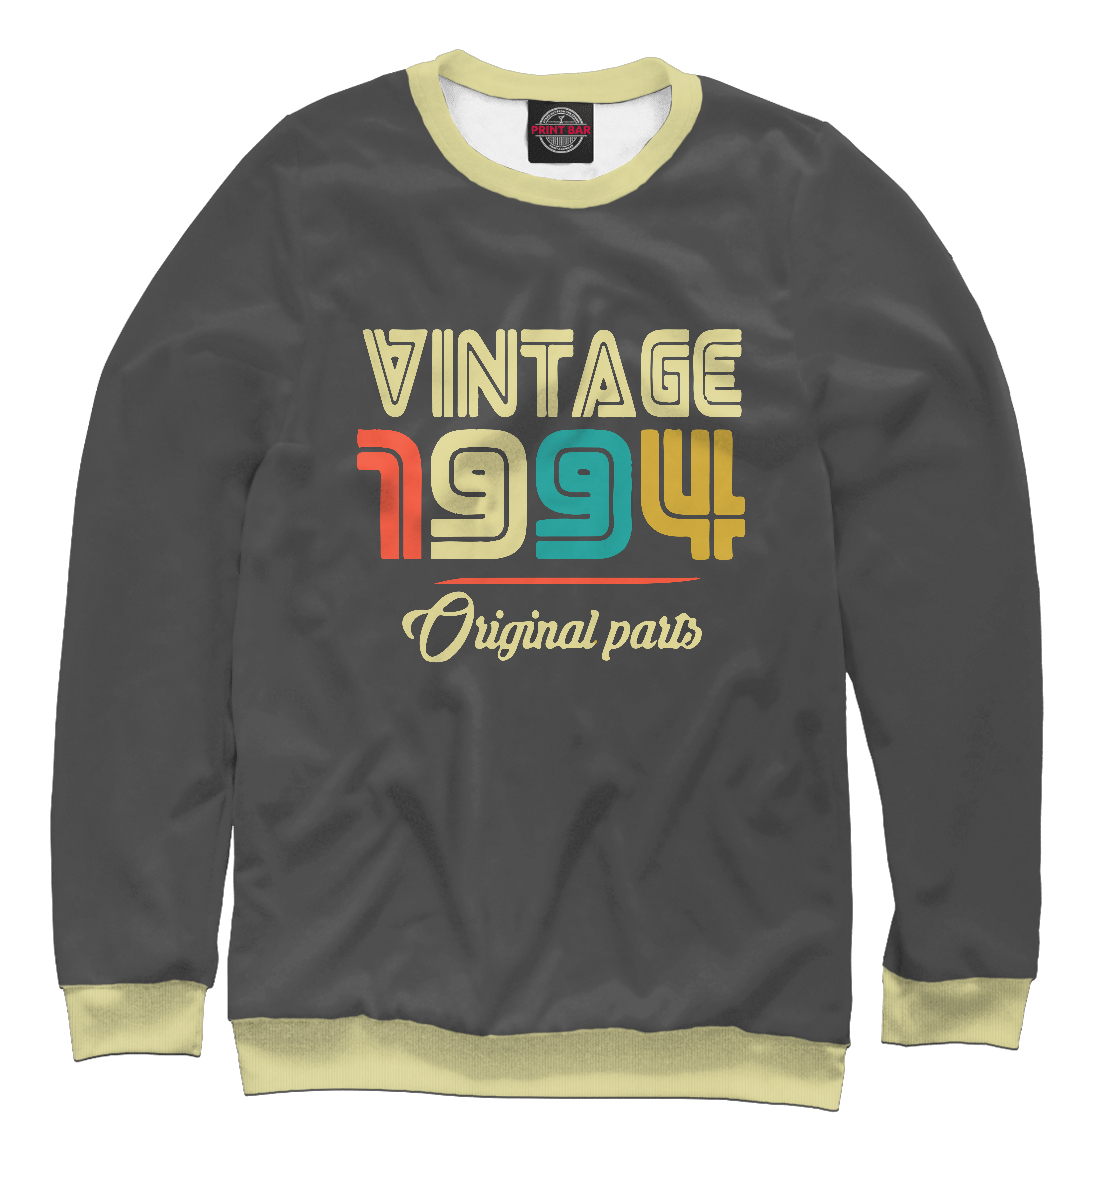 Vintage 1994 Original